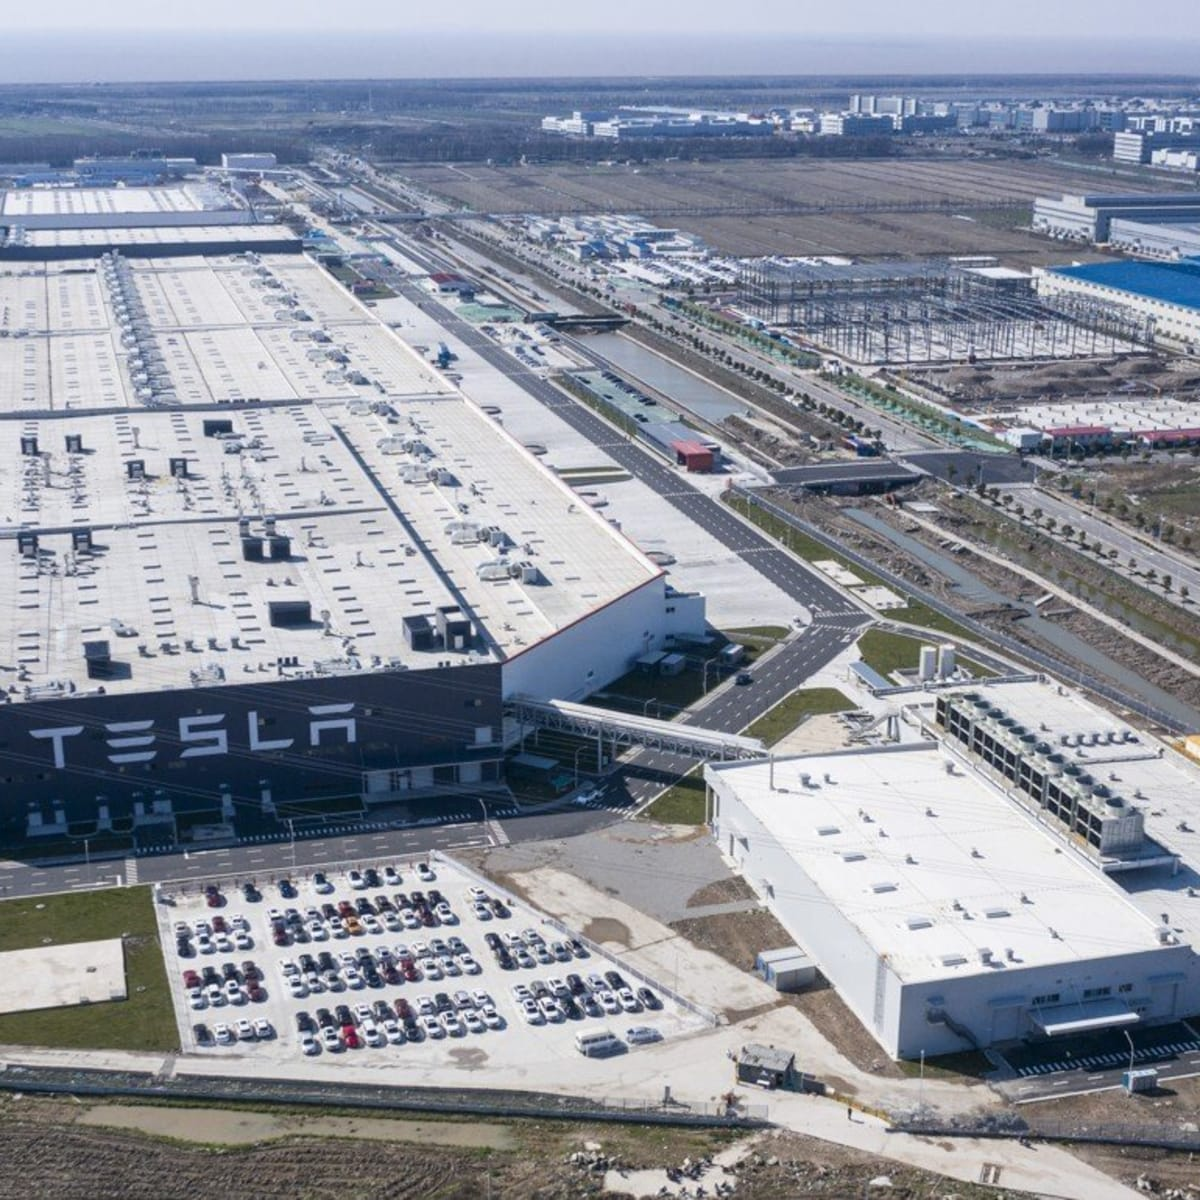 Tesla Wooed With Tax Breaks To Build Texas Gigafactory Thestreet